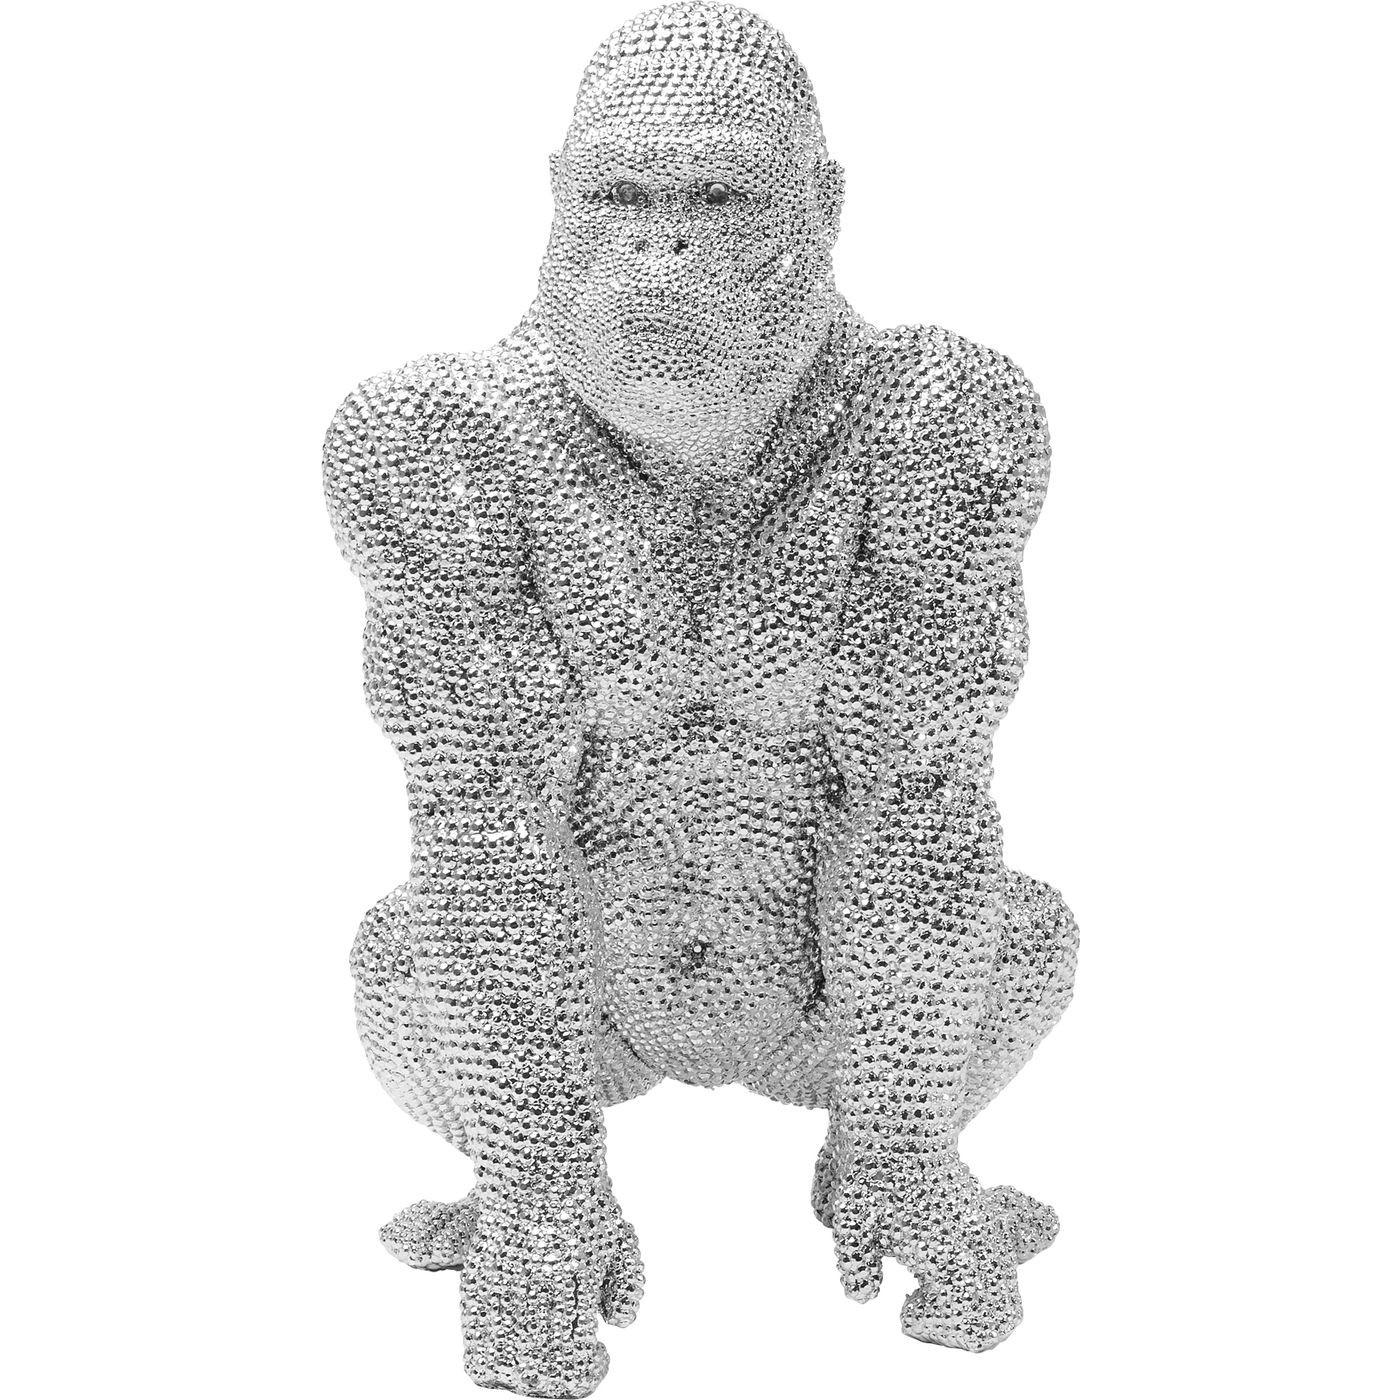 Statuette gorille strass en polyrésine argentée H46